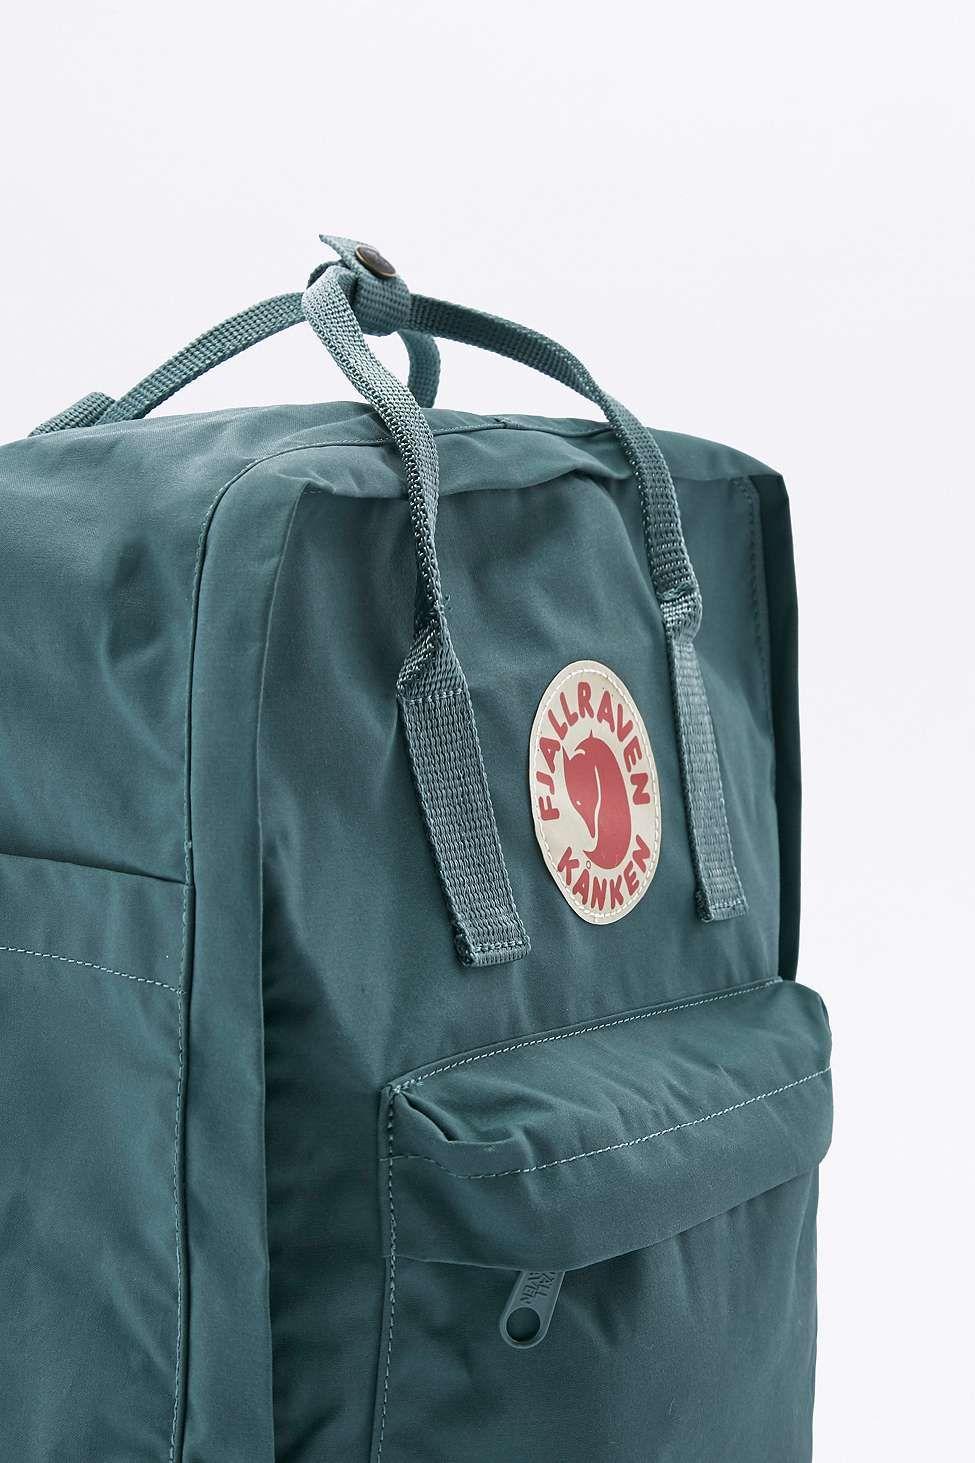 Fjallraven Kanken Classic Frost Green Backpack Fjallraven Kanken Kanken Backpack Backpack Fjallraven